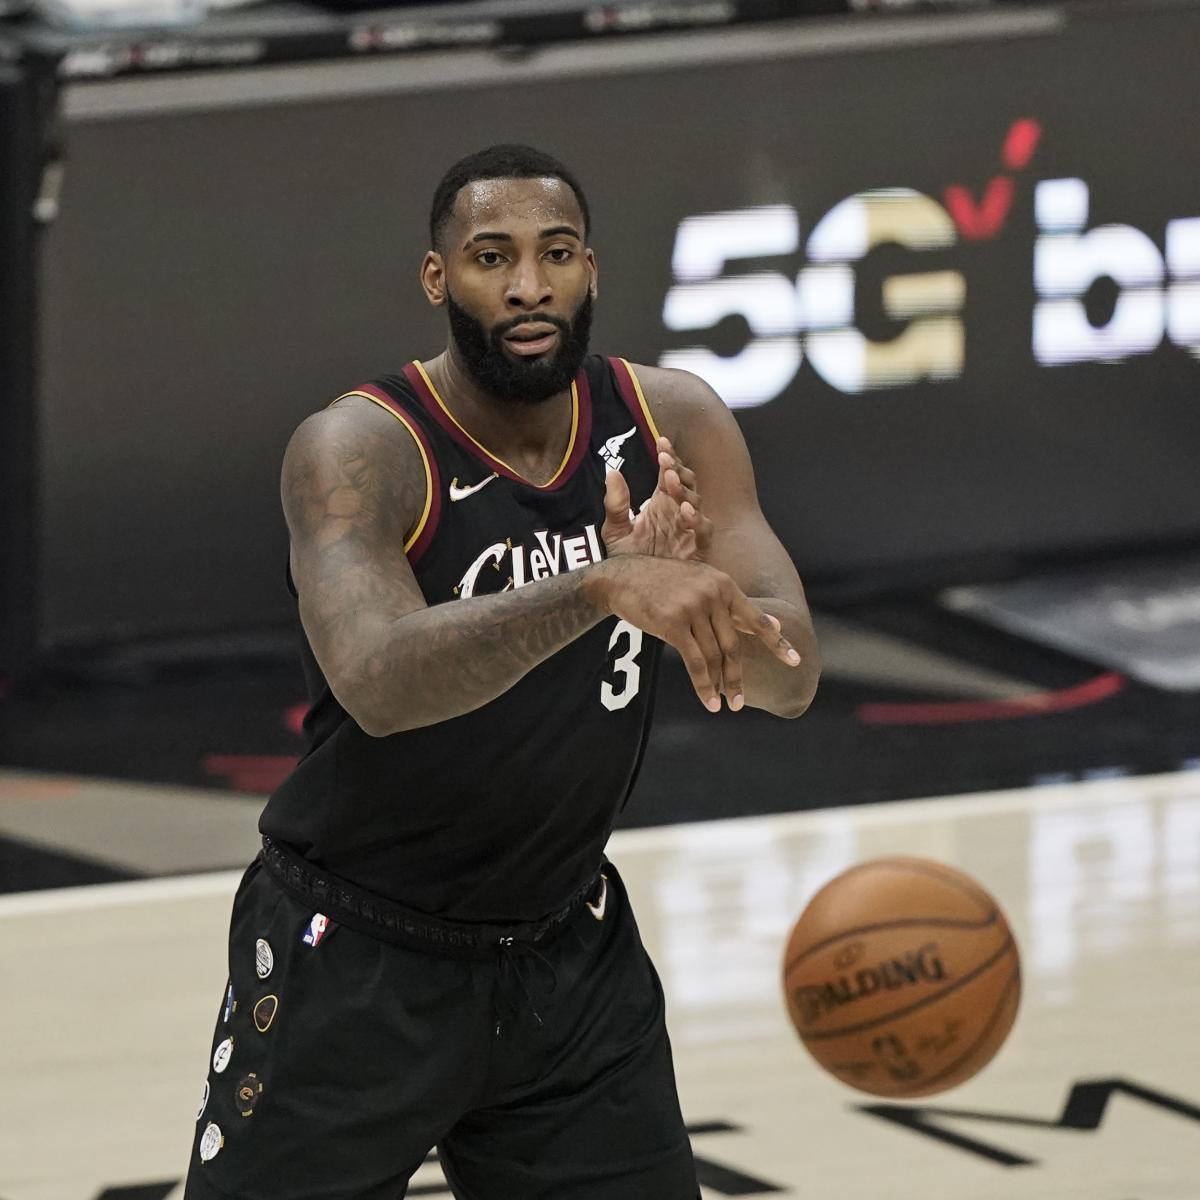 <p>Andre Drummond Trade Rumors: Cavs Interested in Draft Picks to Veteran Center thumbnail